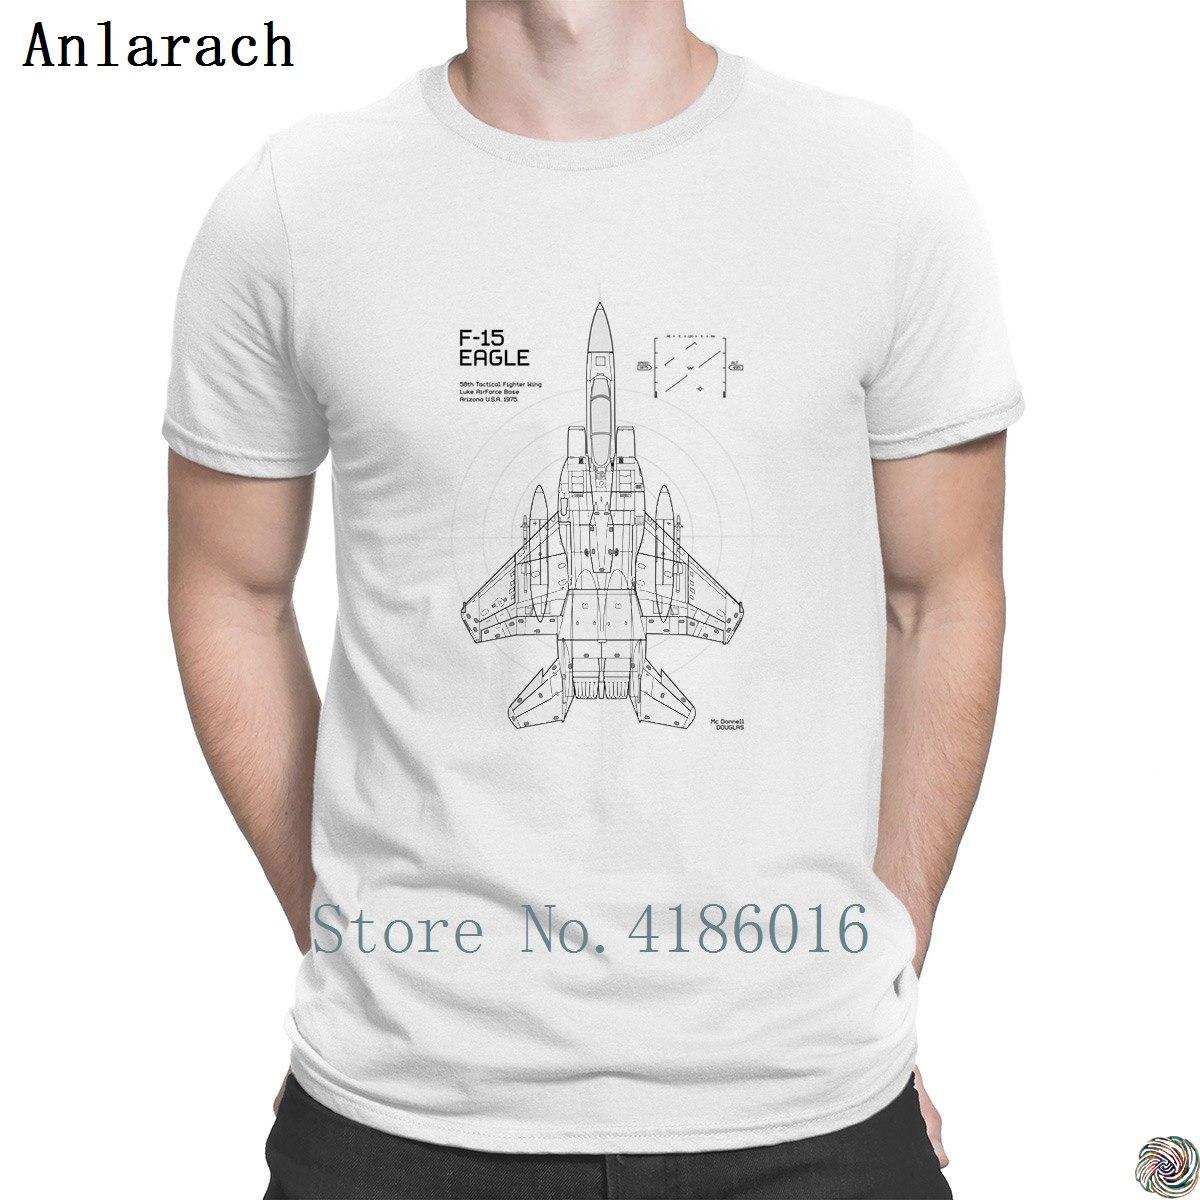 1a15146b89 Compre F 15 Eagle Diagrama De Aeronaves Camisetas Família Tee Top ...